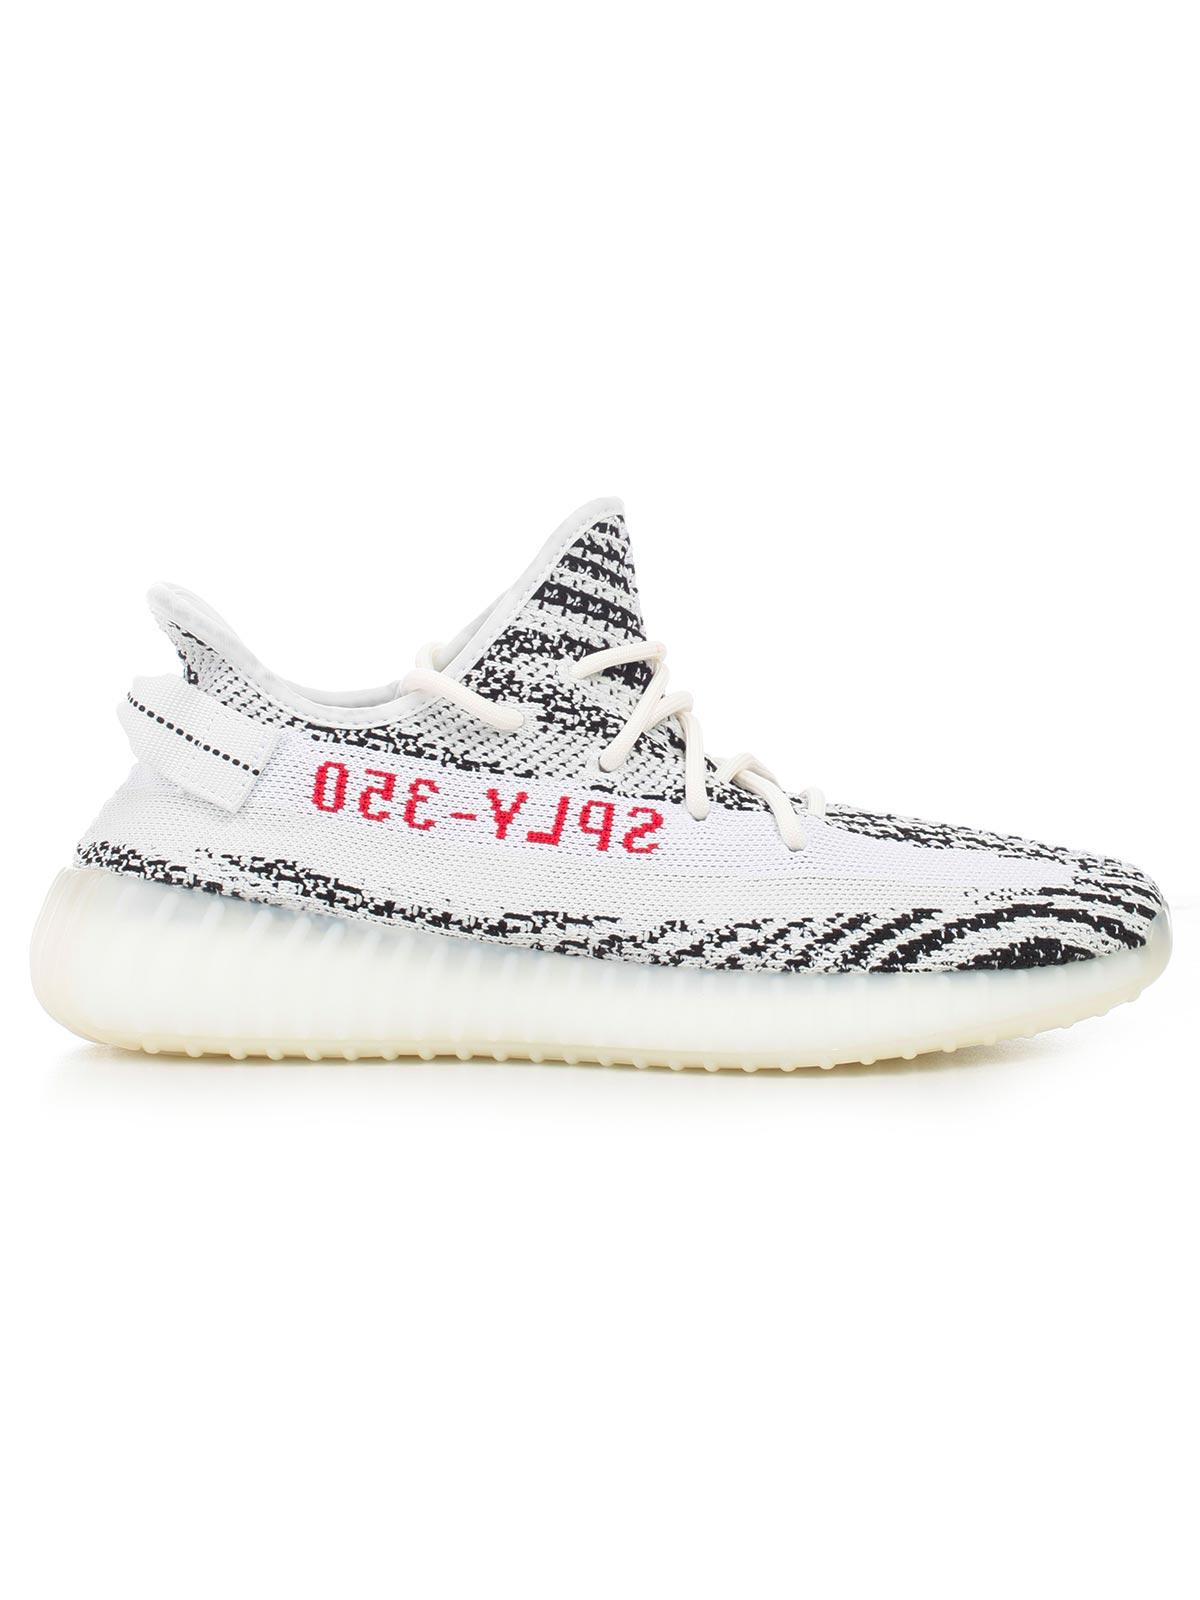 sports shoes bde83 0daaa Yeezy Shoes